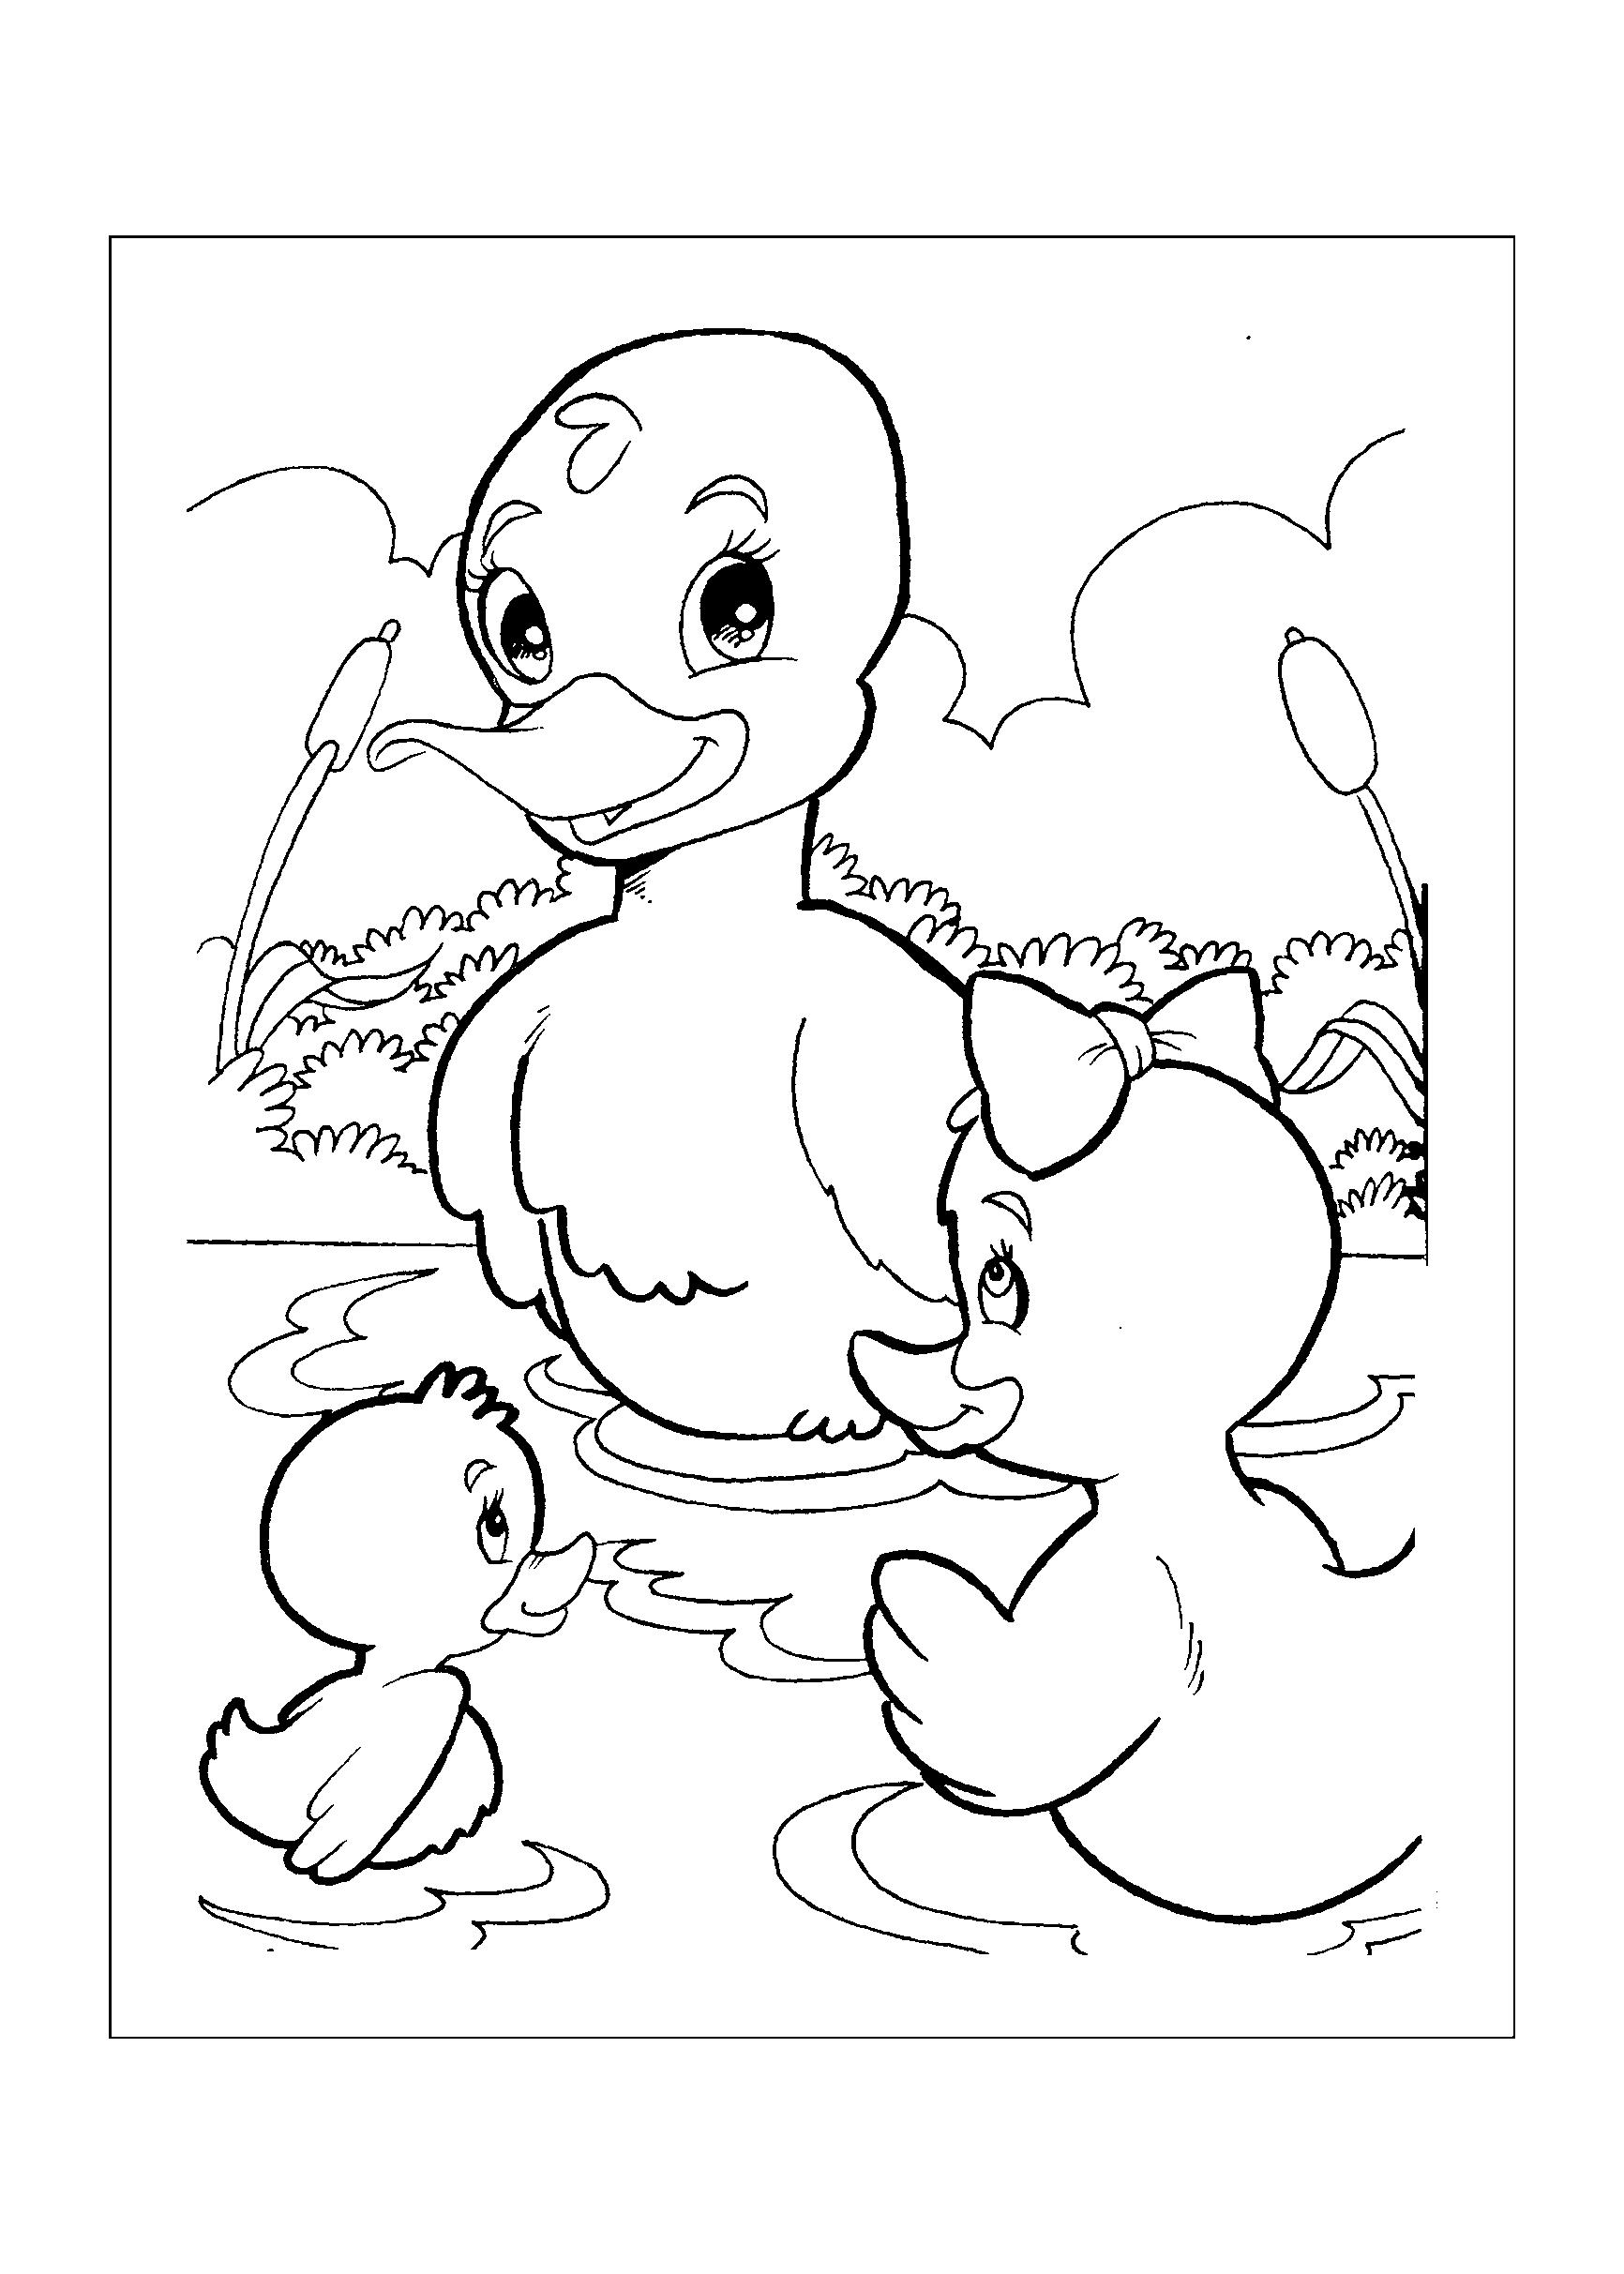 0167-desenho-colorir-pato